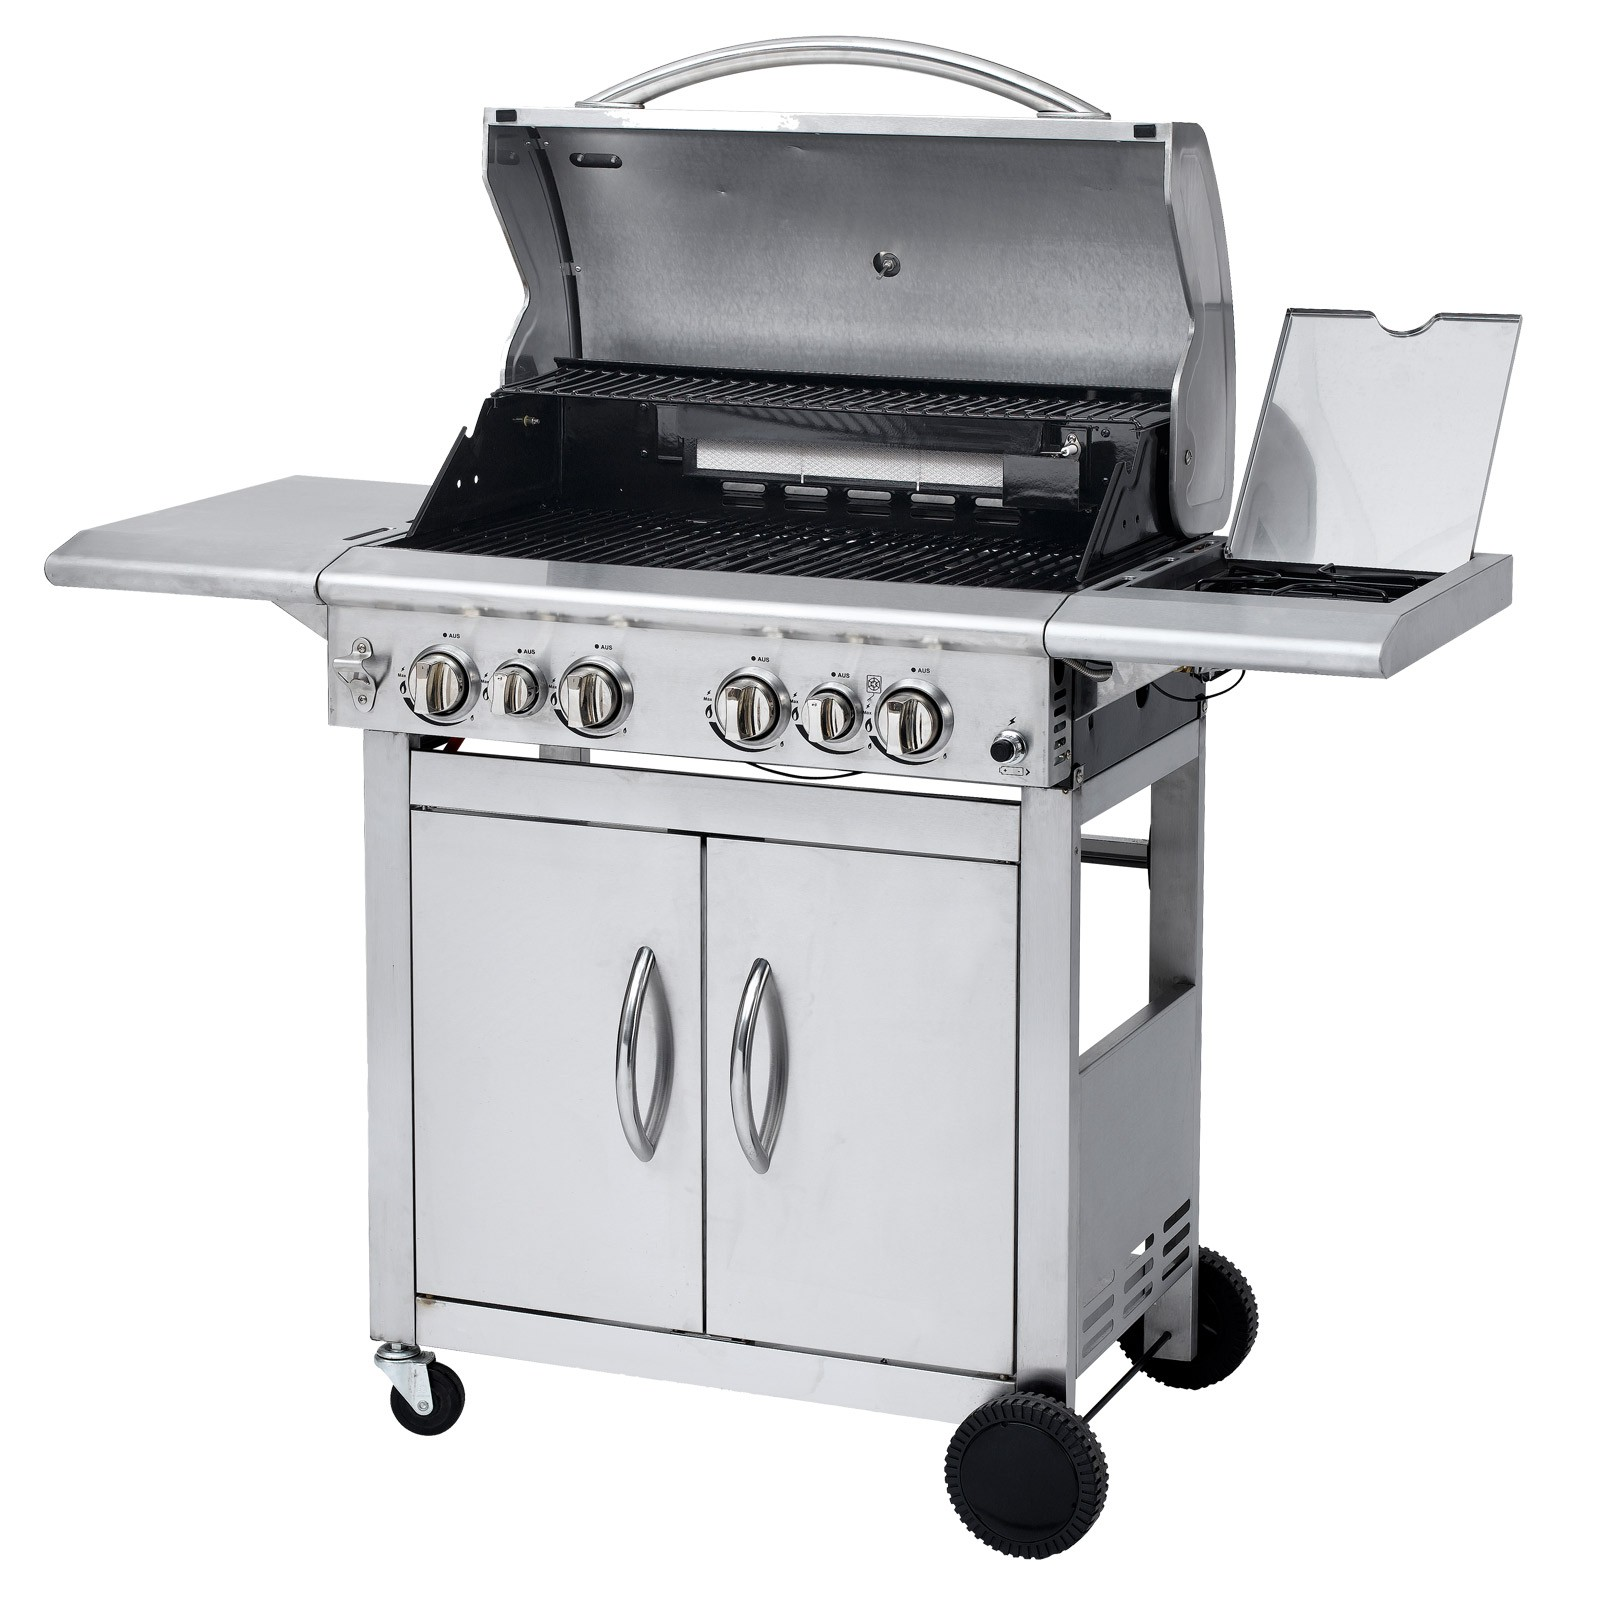 tepro gasgrill grillwagen bbq grill barbecue keansburg partygrill silber ebay. Black Bedroom Furniture Sets. Home Design Ideas